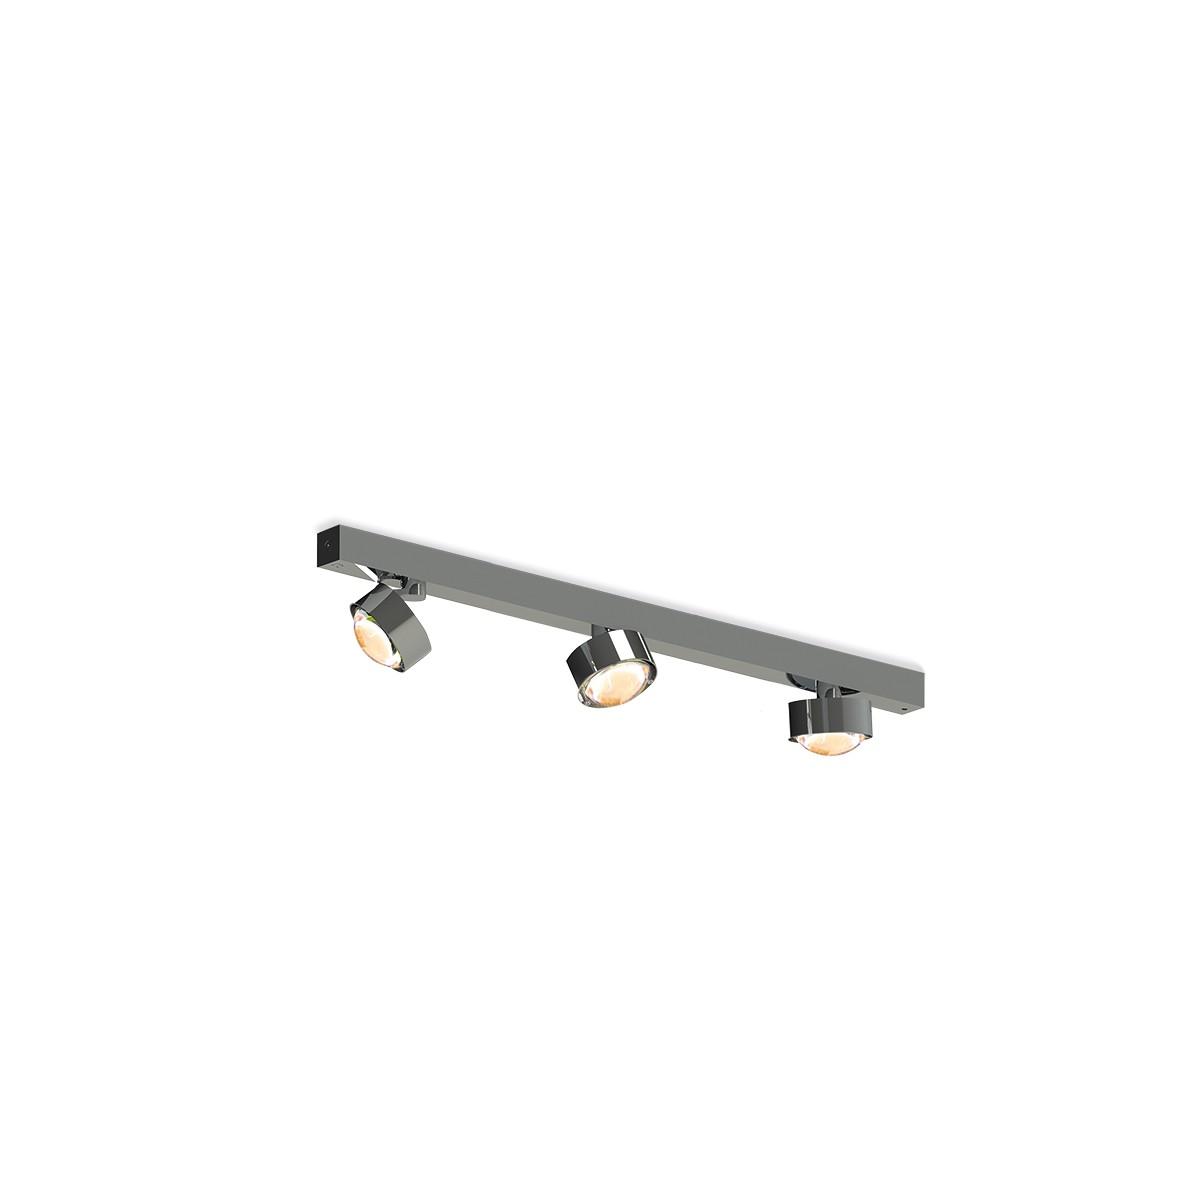 Top Light Puk Choice Move Deckenleuchte, 65 cm